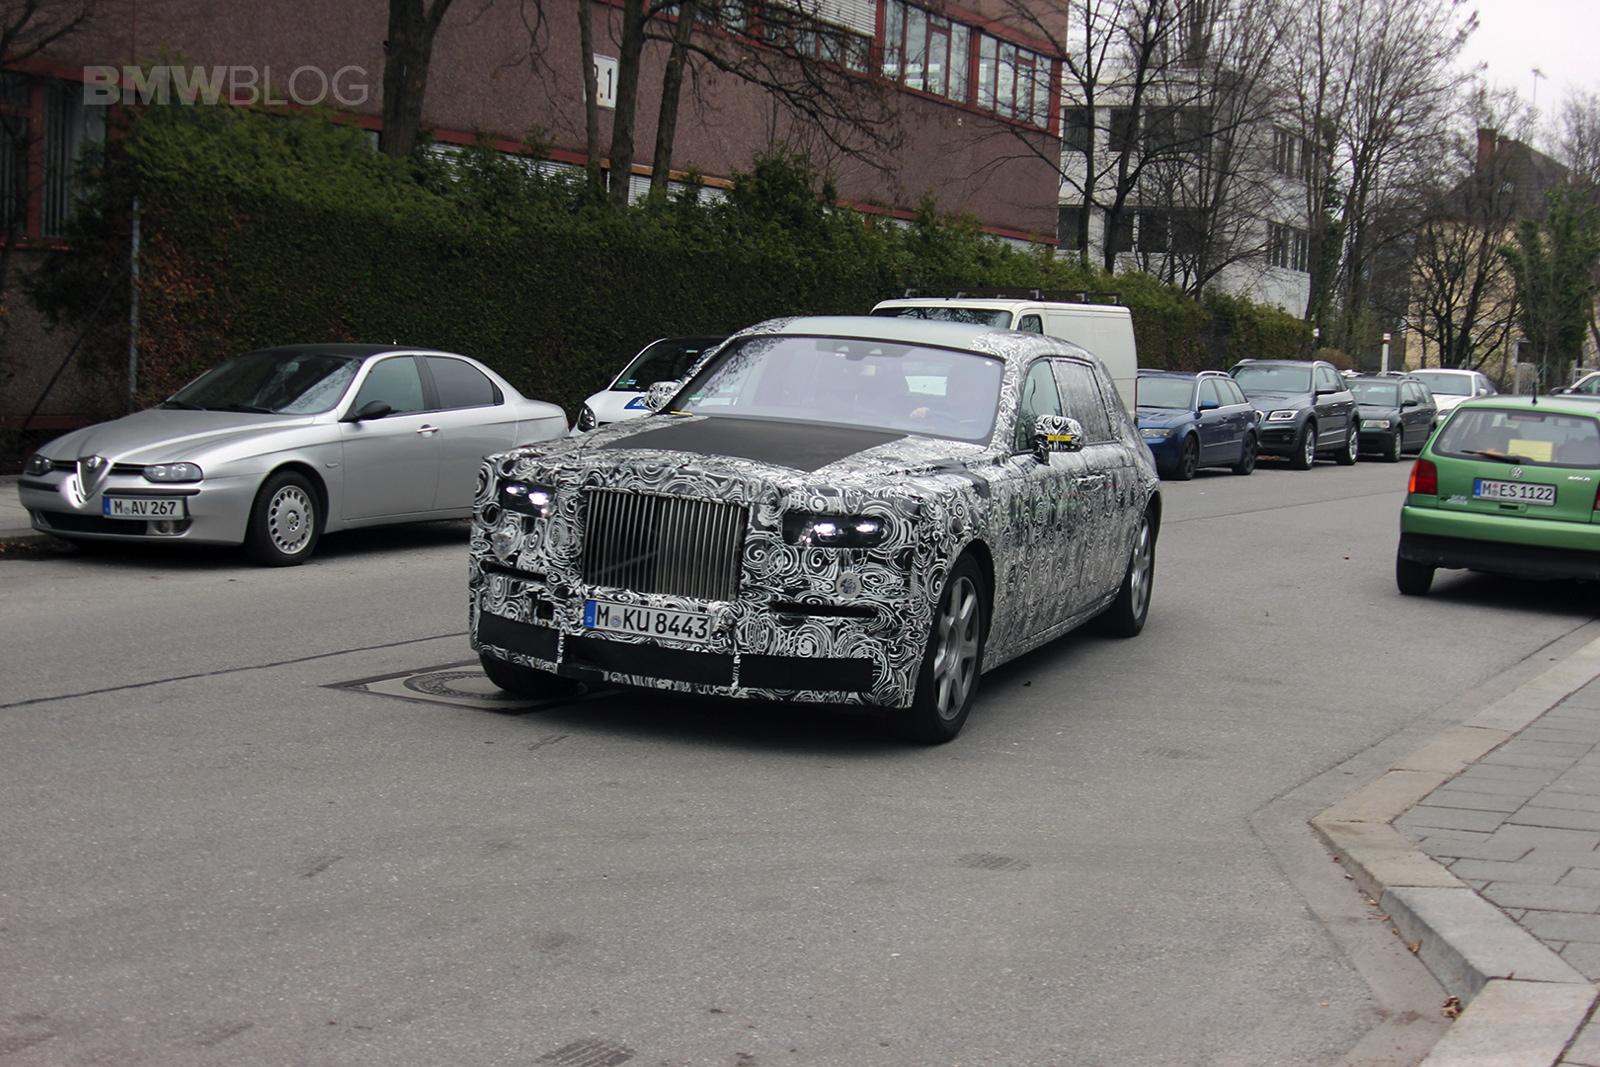 New Rolls Royce Phantom >> Spy Photos: 2018 Rolls-Royce Phantom